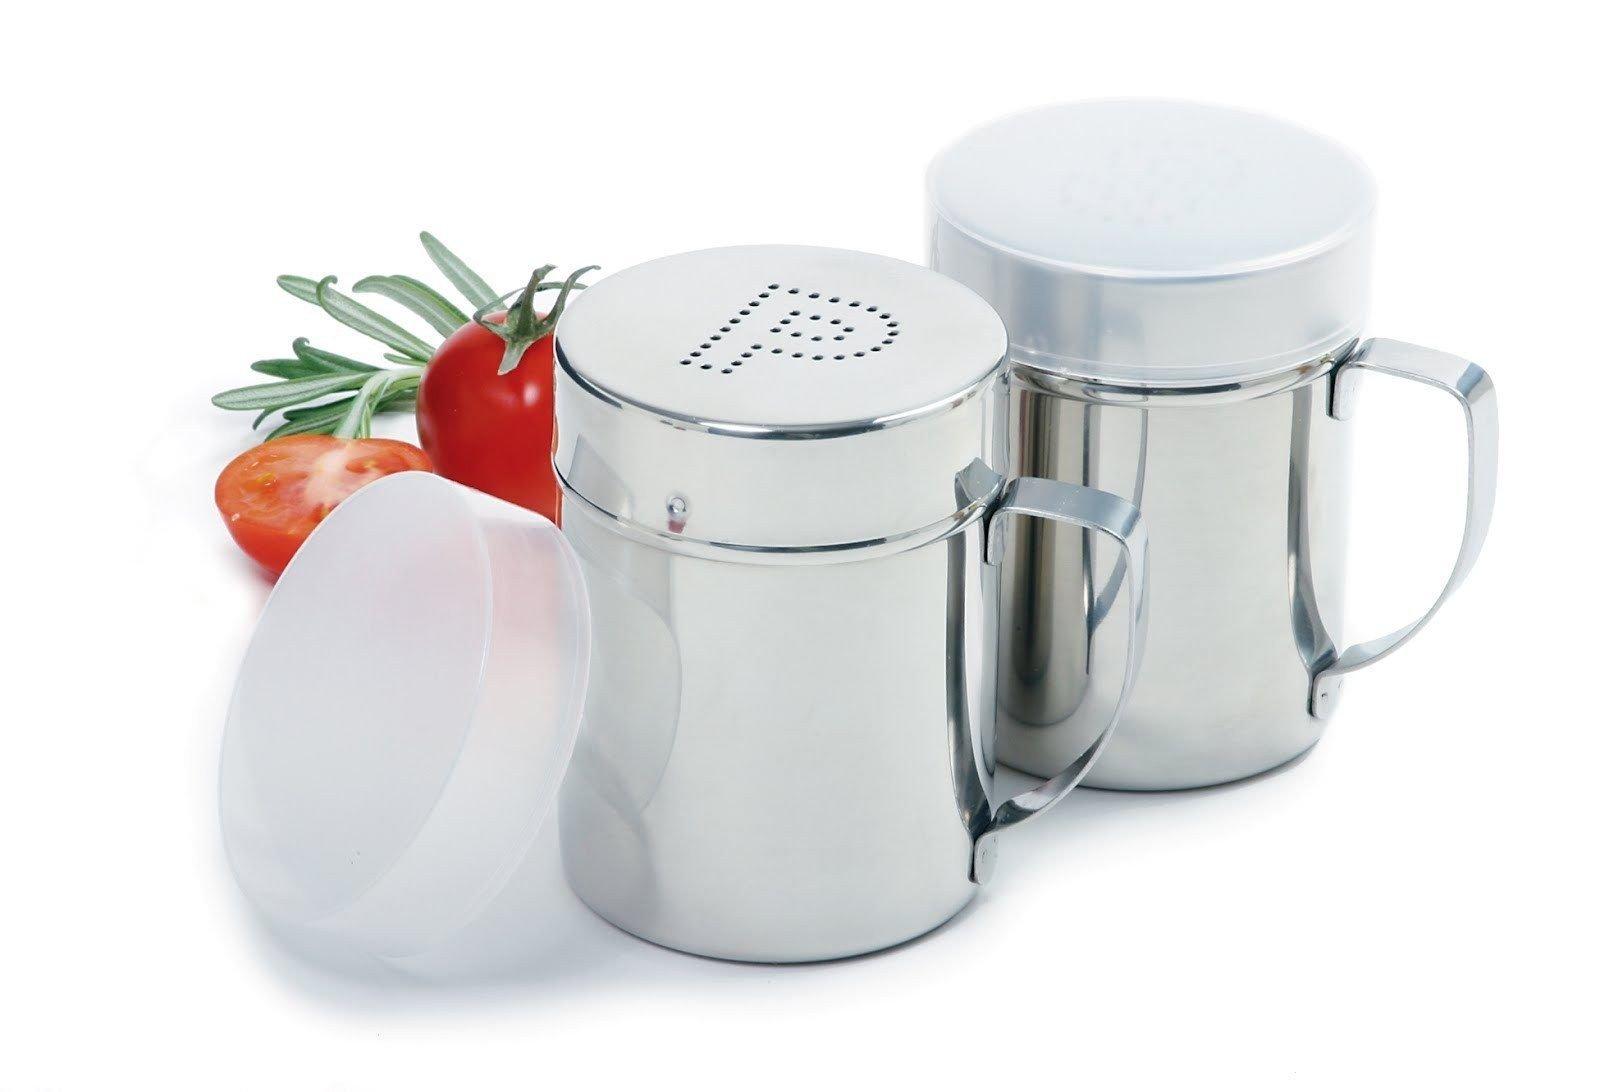 Norpro NOR-763 S/S Salt/Pepper Shaker Set, 1 EA